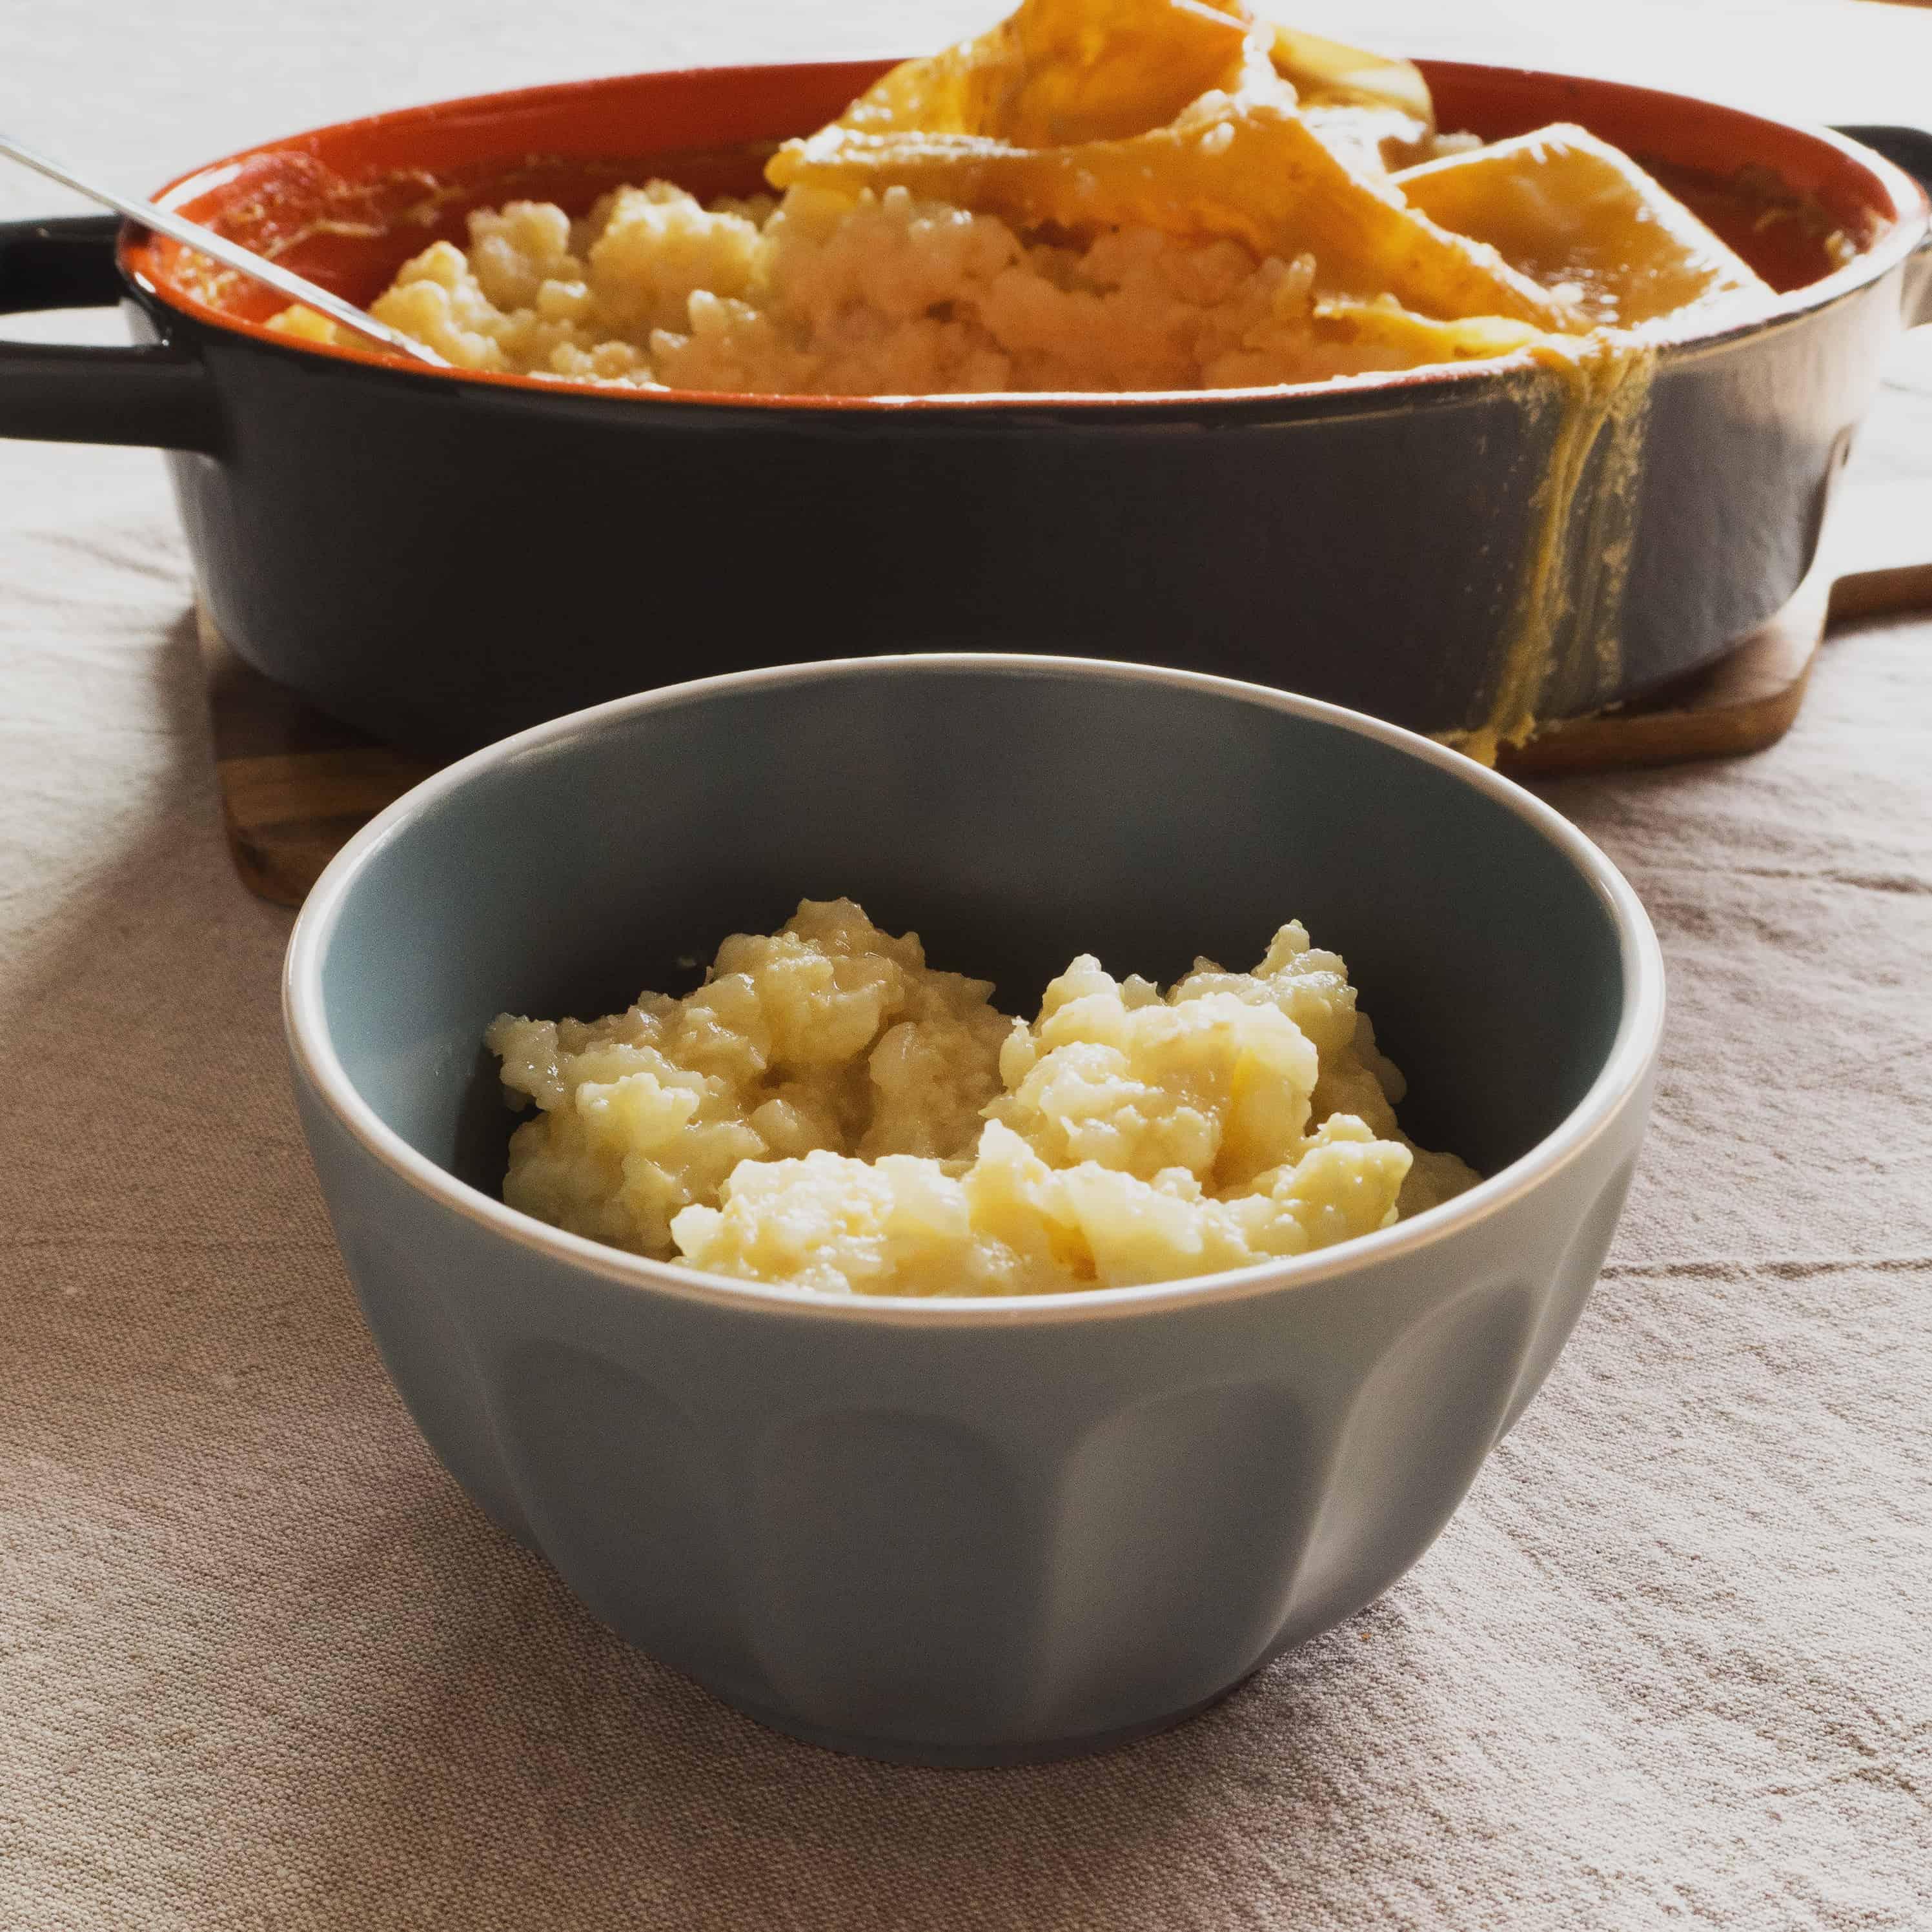 Gluten-Free, Vegan Lemongrass and Ginger Rice Pudding - ready to eat.